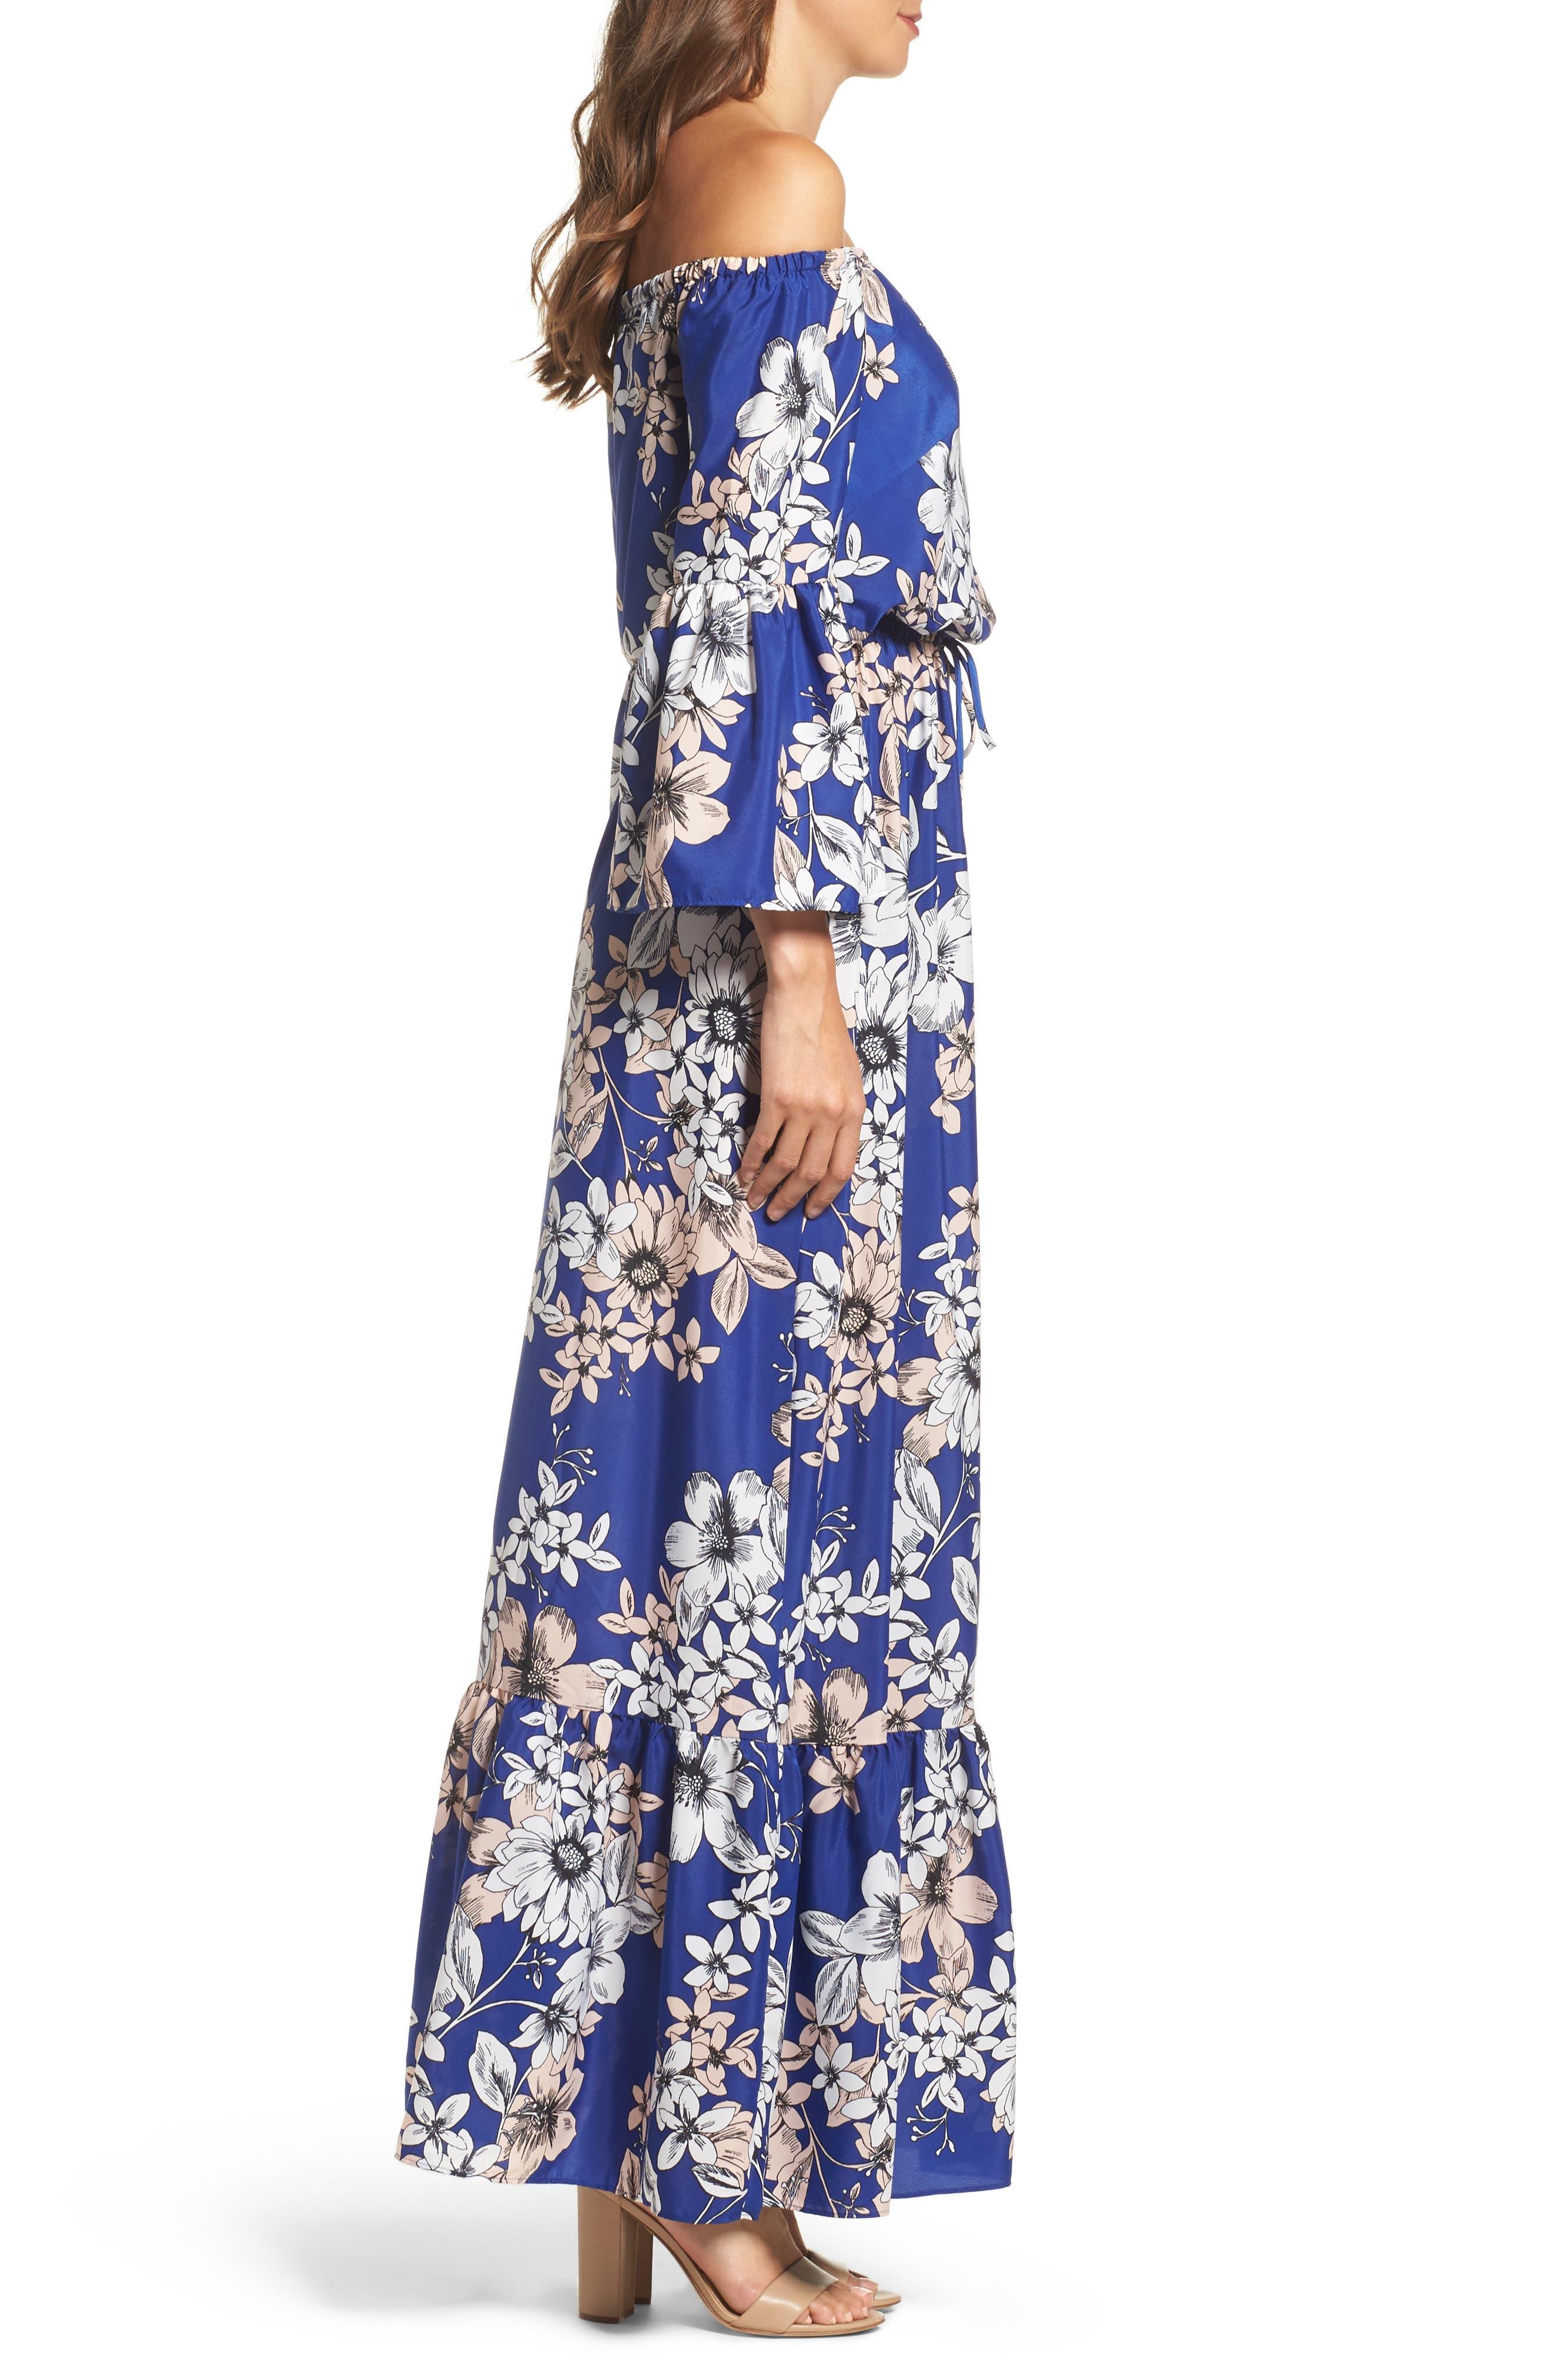 Off the Shoulder Floral Maxi Dress,                             Alternate thumbnail 3, color,                             COBALT